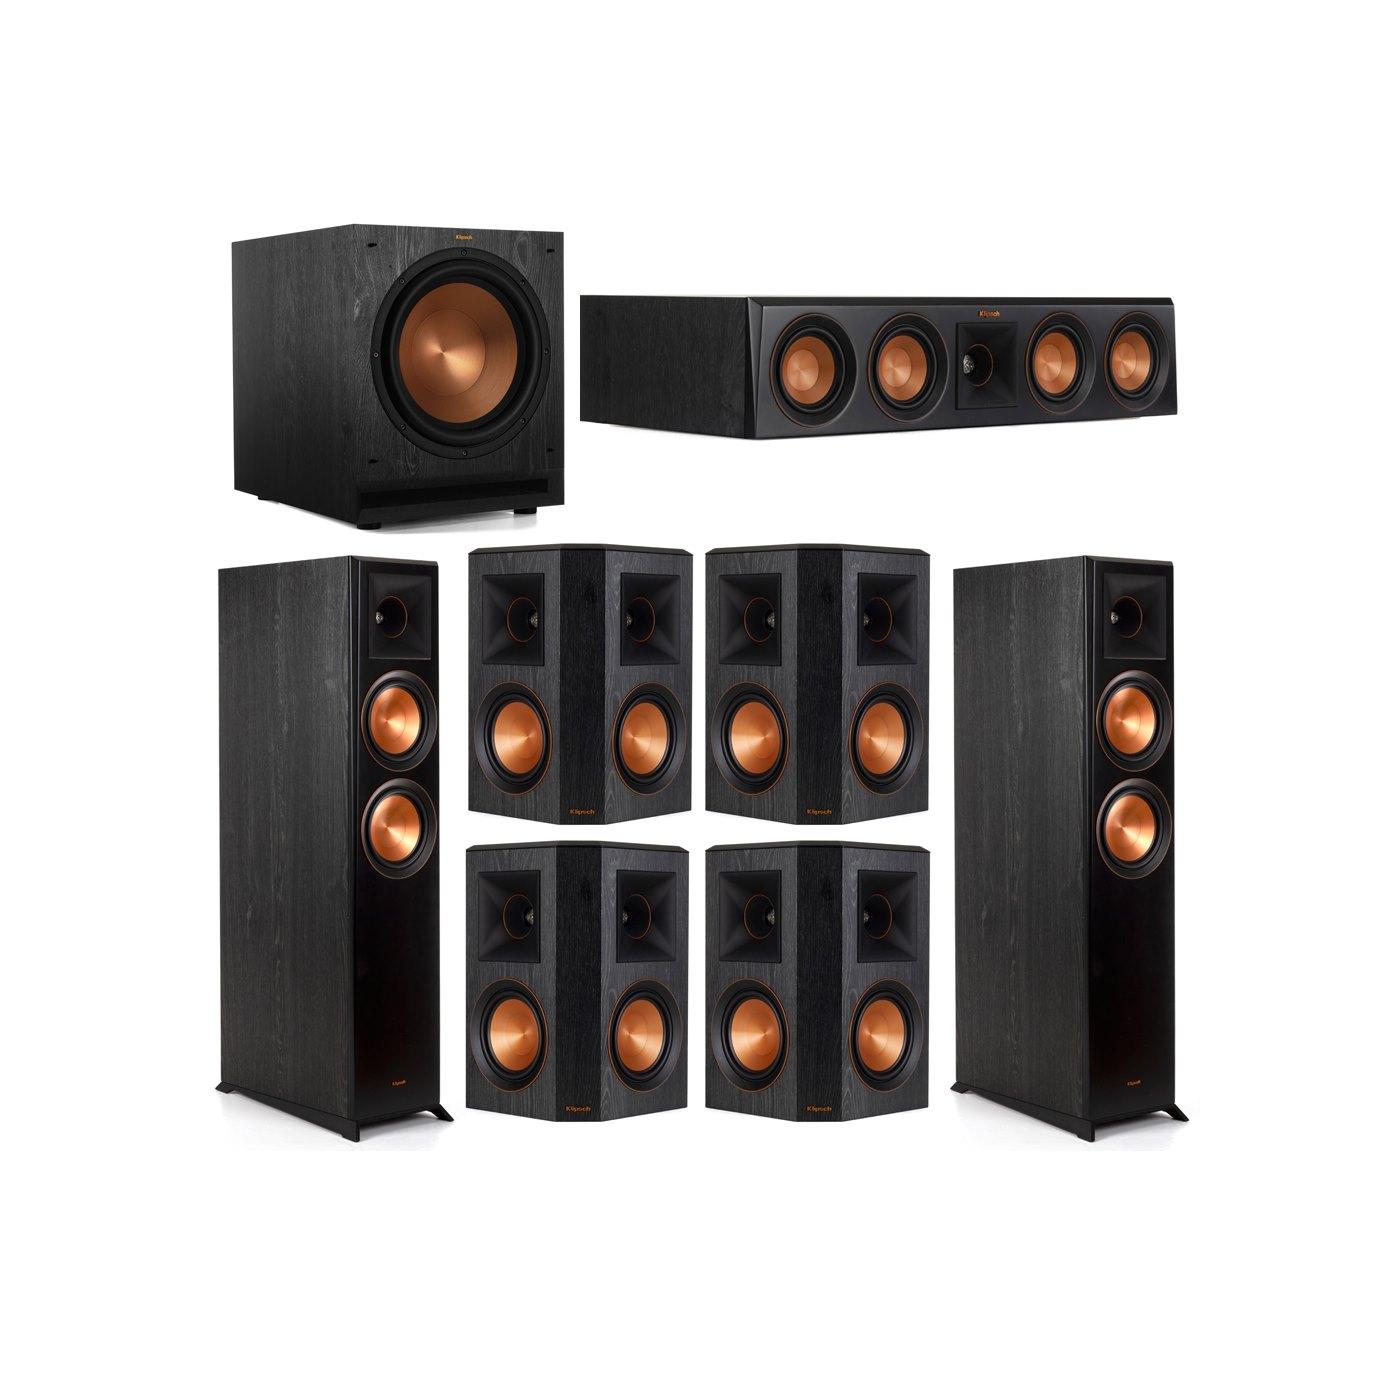 Klipsch 7.1 System with 2 RP-6000F Floorstanding Speakers, 1 Klipsch RP-404C Center Speaker, 4 Klipsch RP-502S Surround Speakers, 1 Klipsch SPL-120 Subwoofer